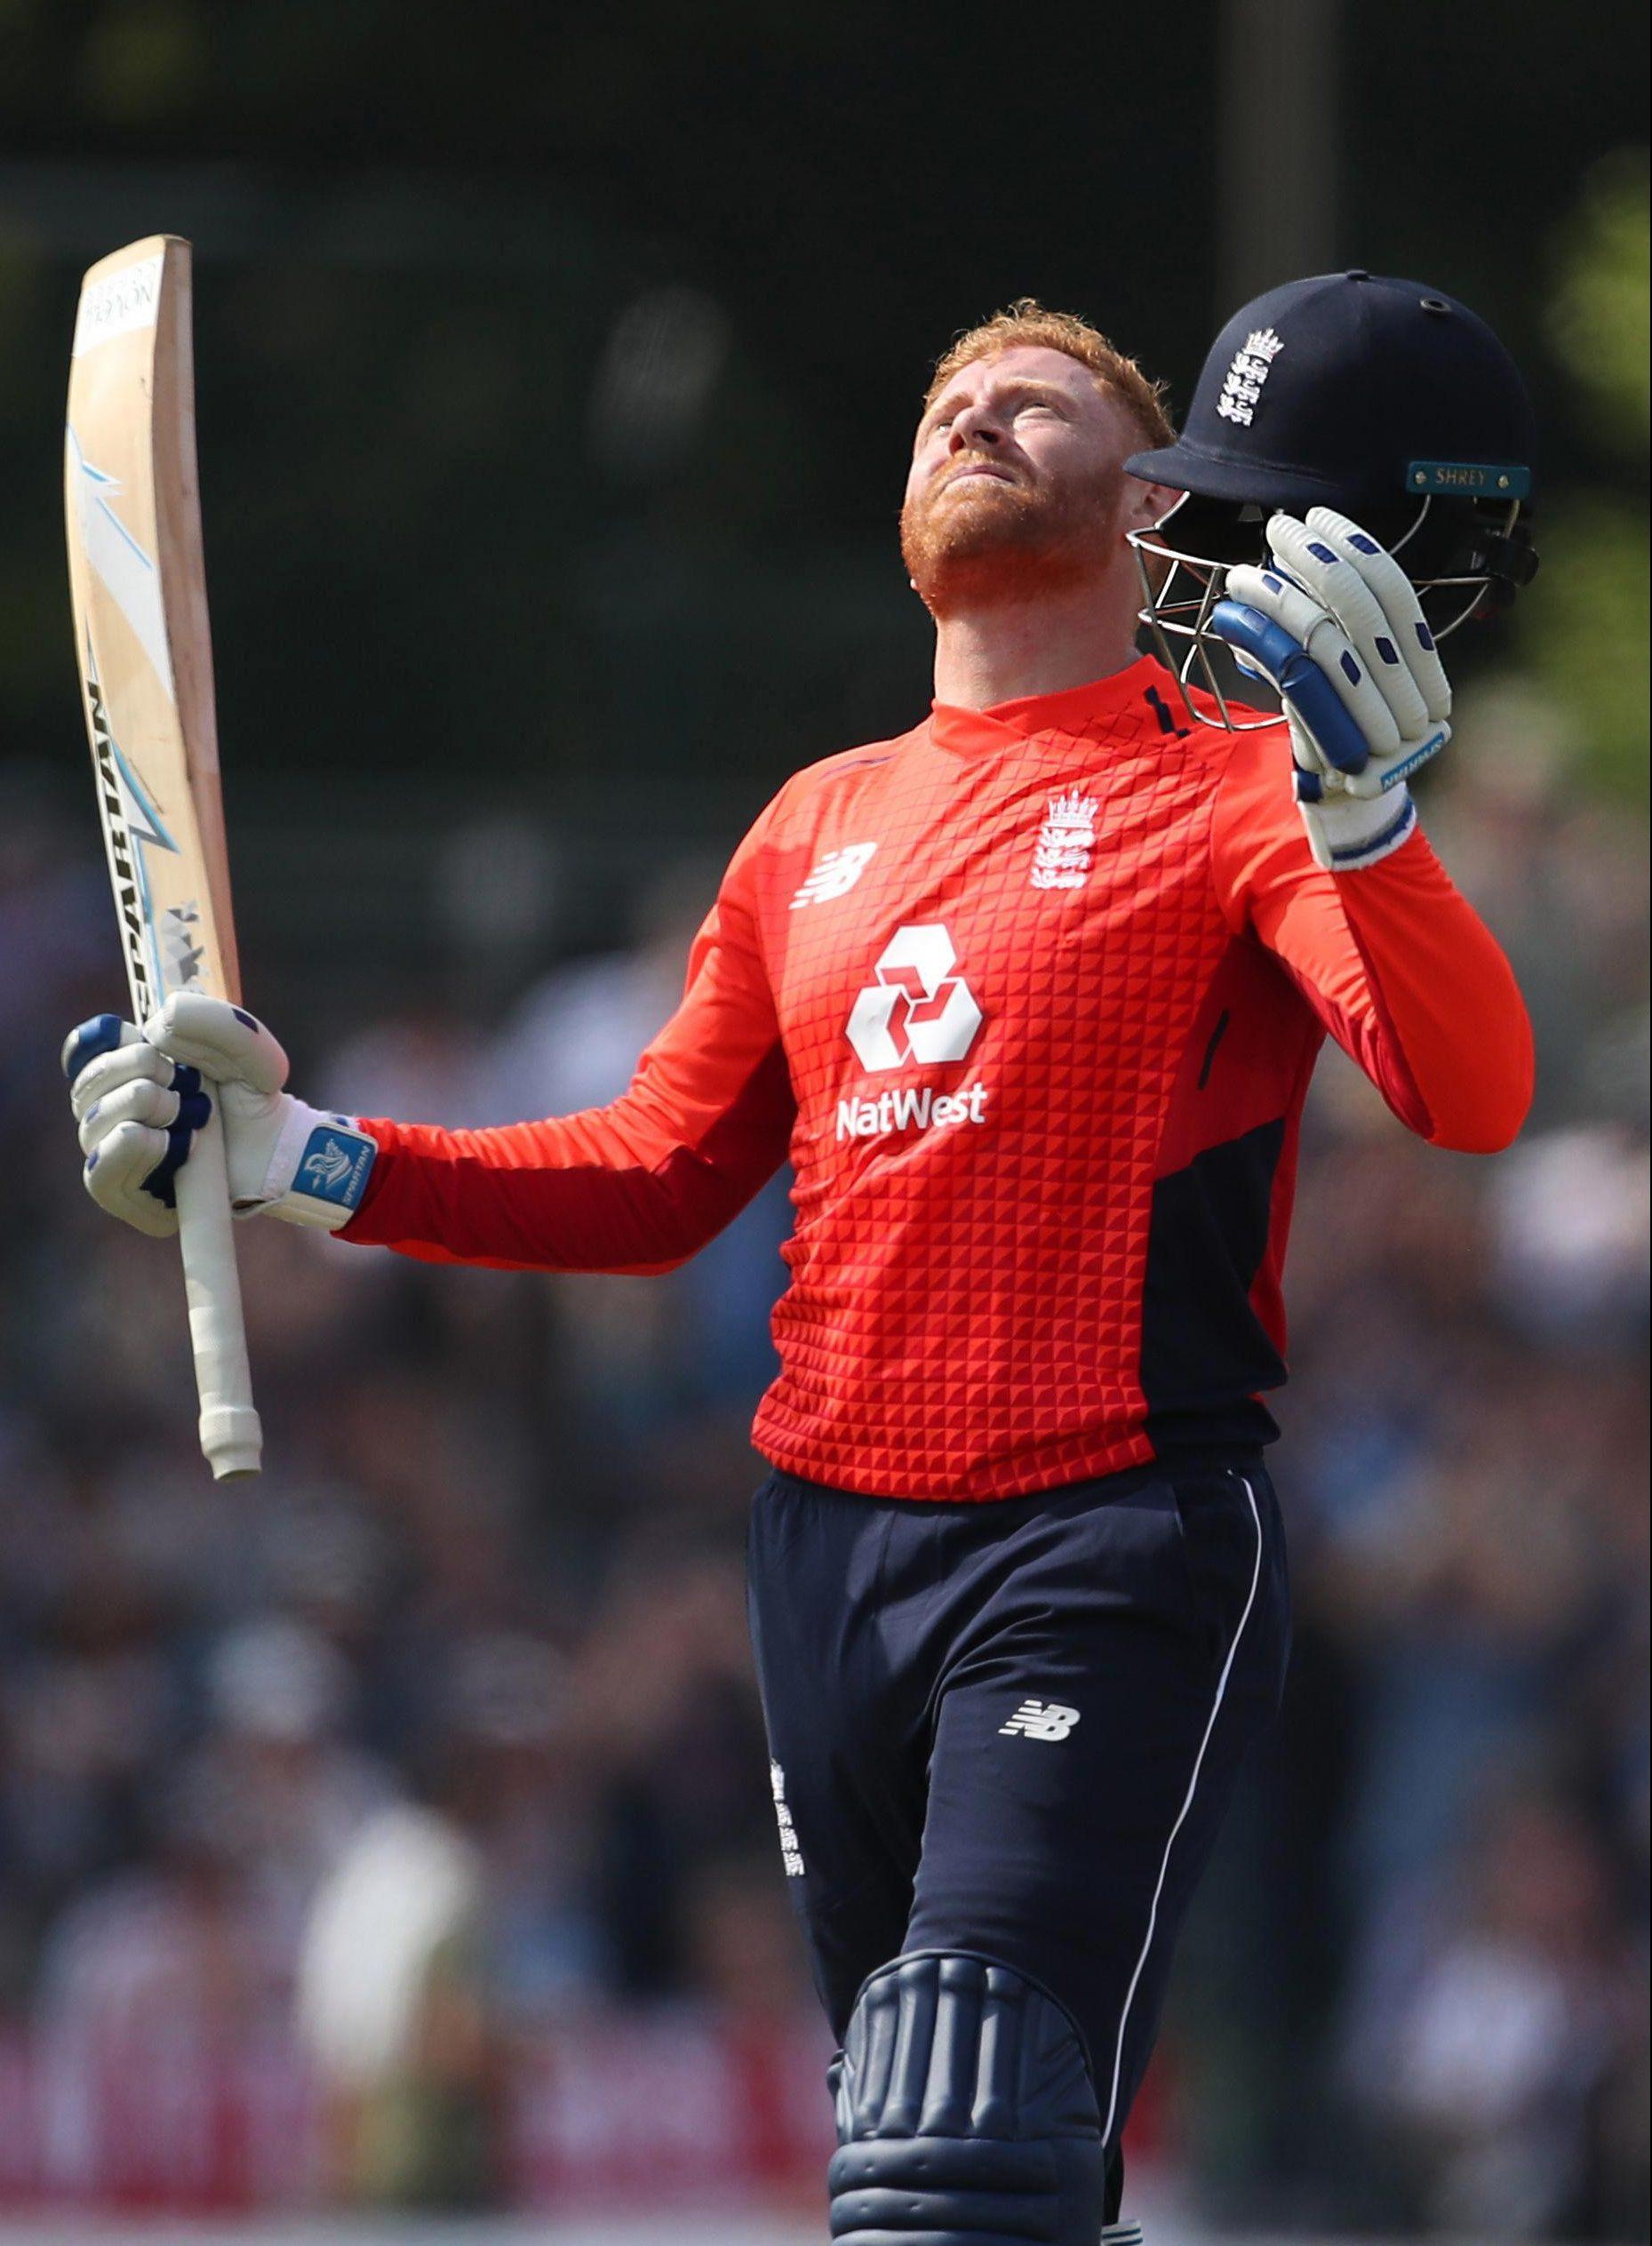 England ace Jonny Bairstow celebrates his century